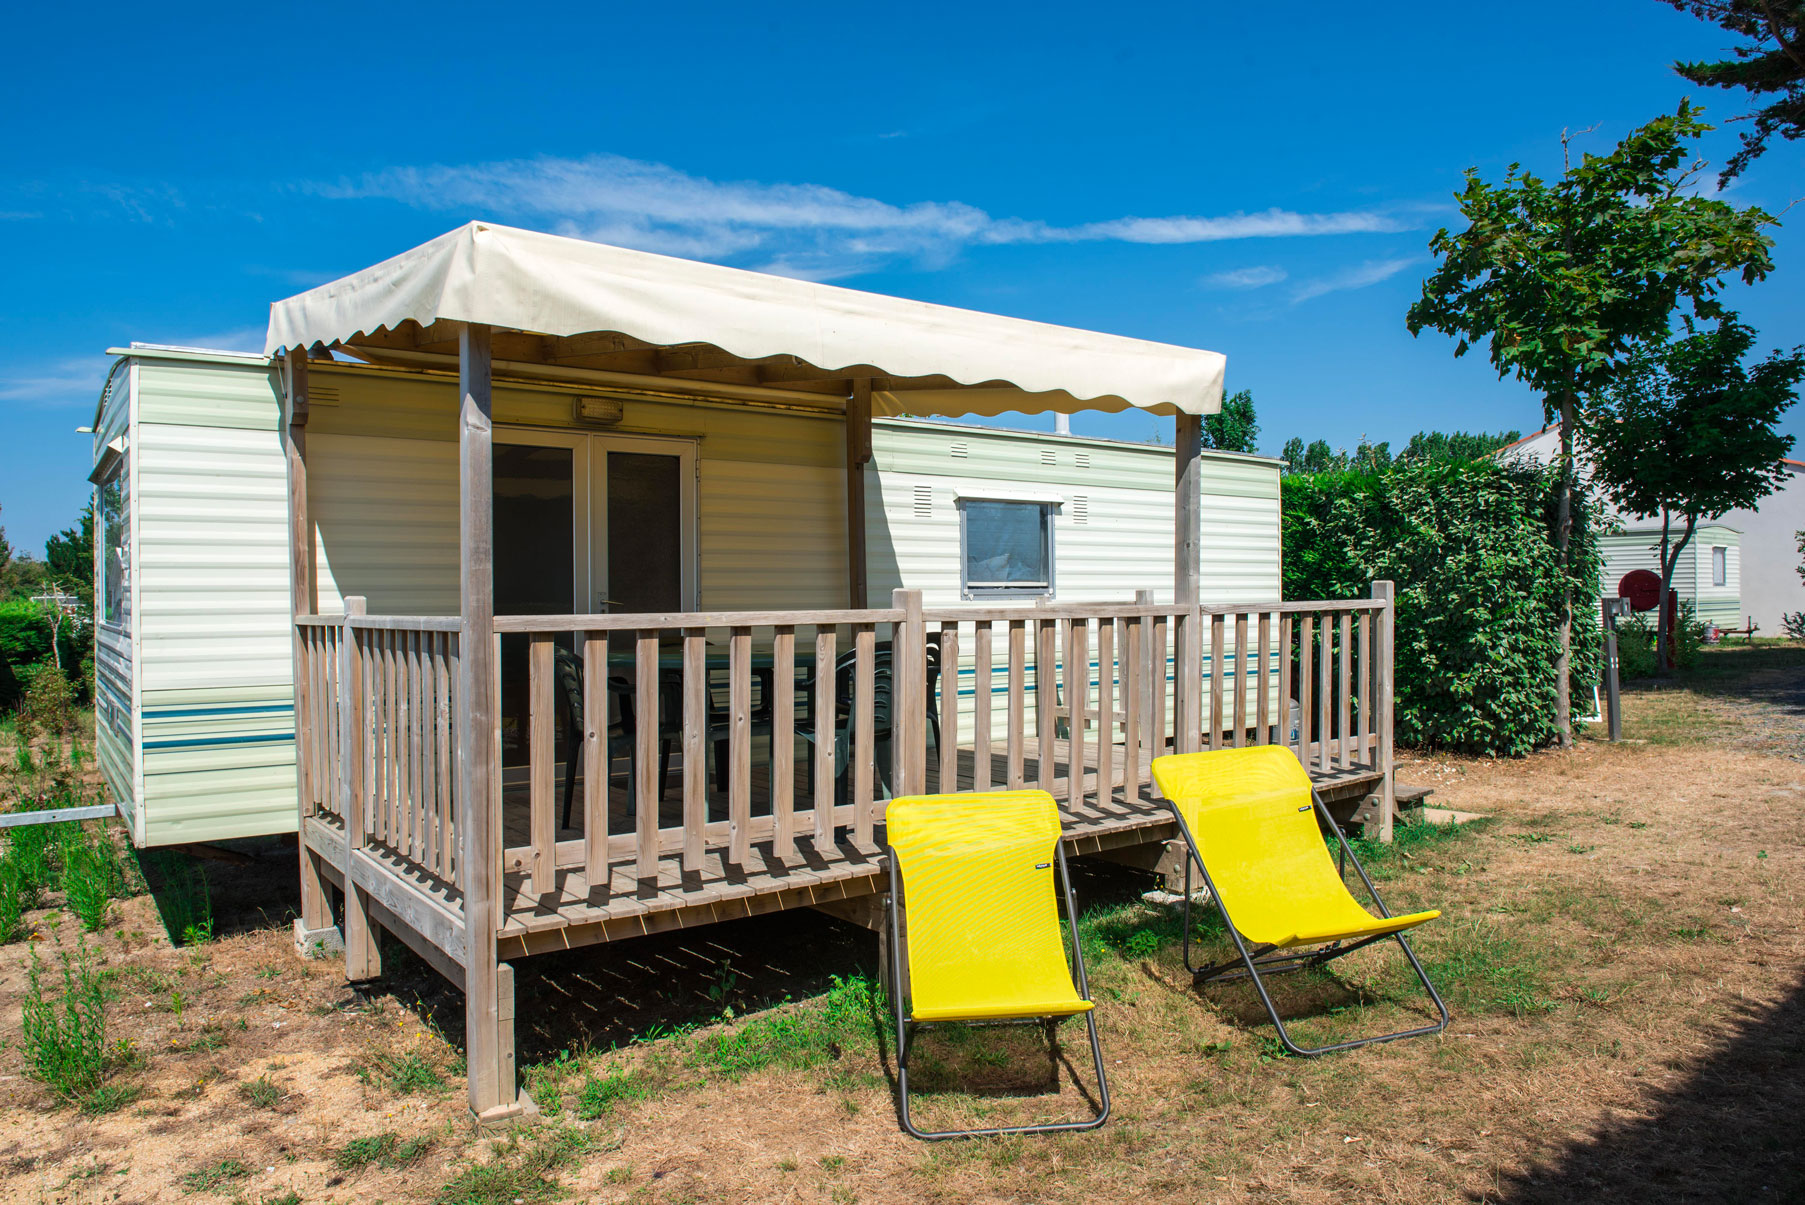 location-mobil-home-4-6-personnes-eco-avec-terrasse-camping-le-port-de-moricq